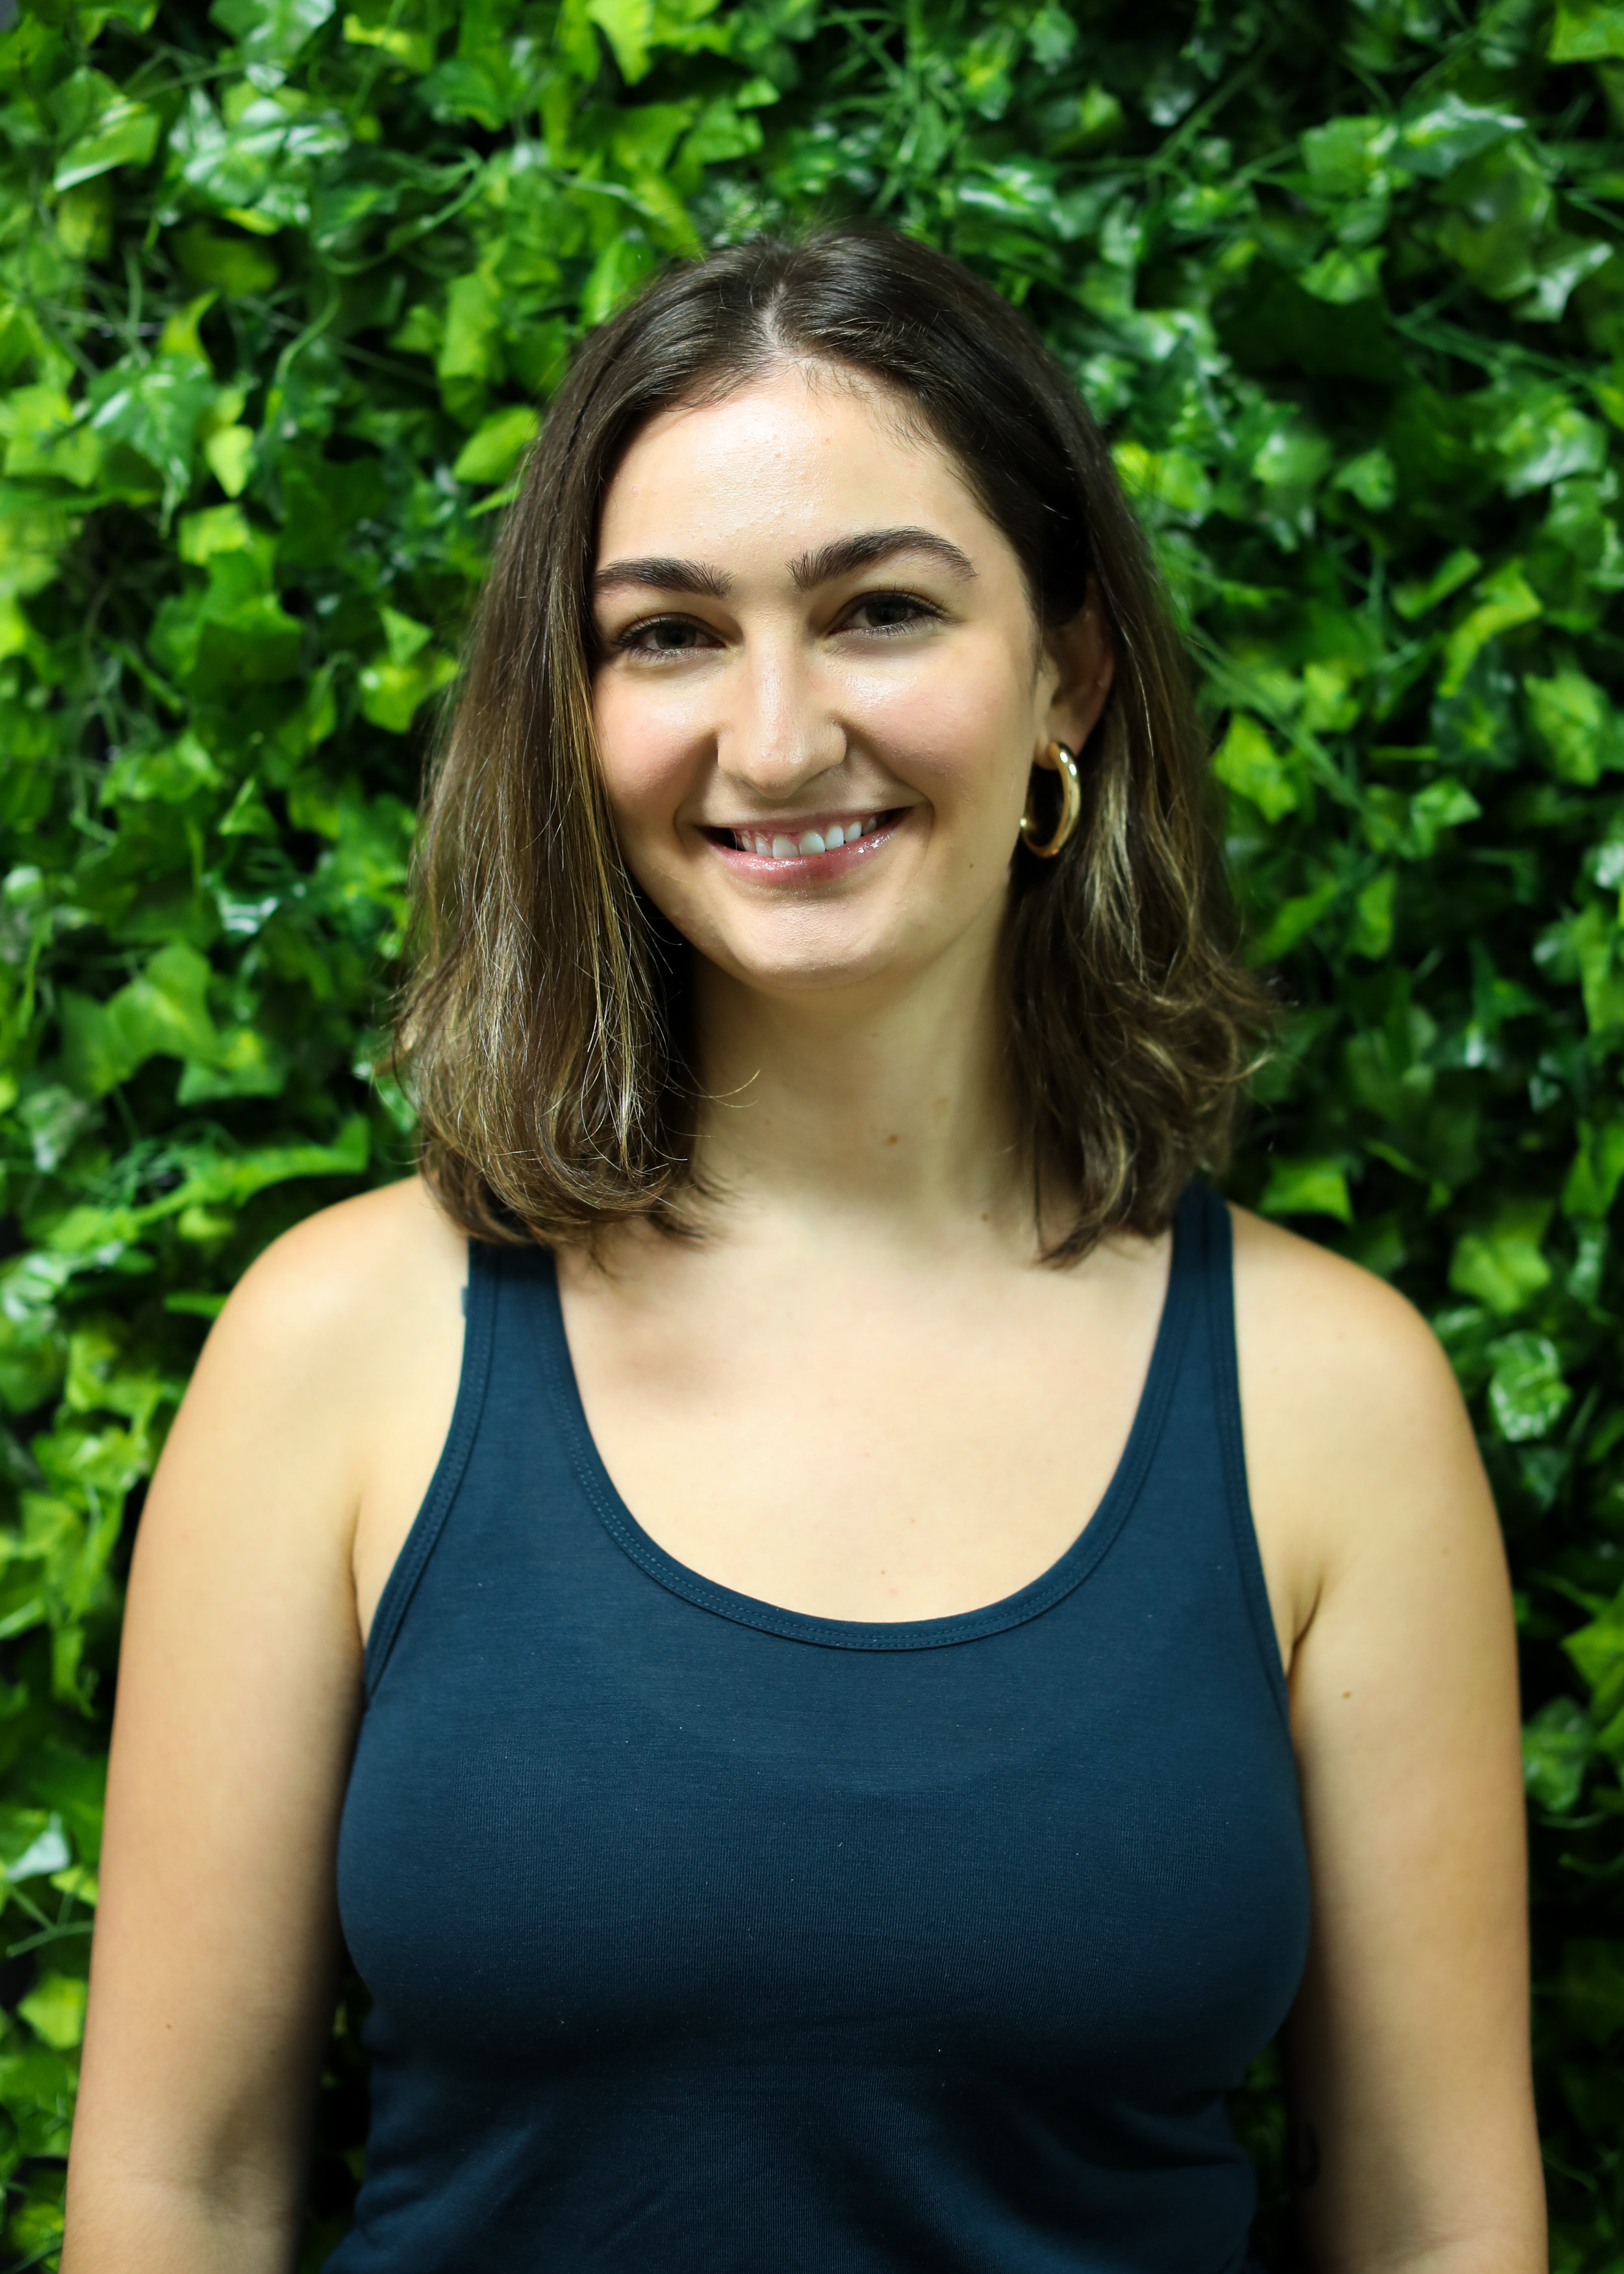 Abigail Gregory // Administrative Assistant // Abigail@dcctally.com